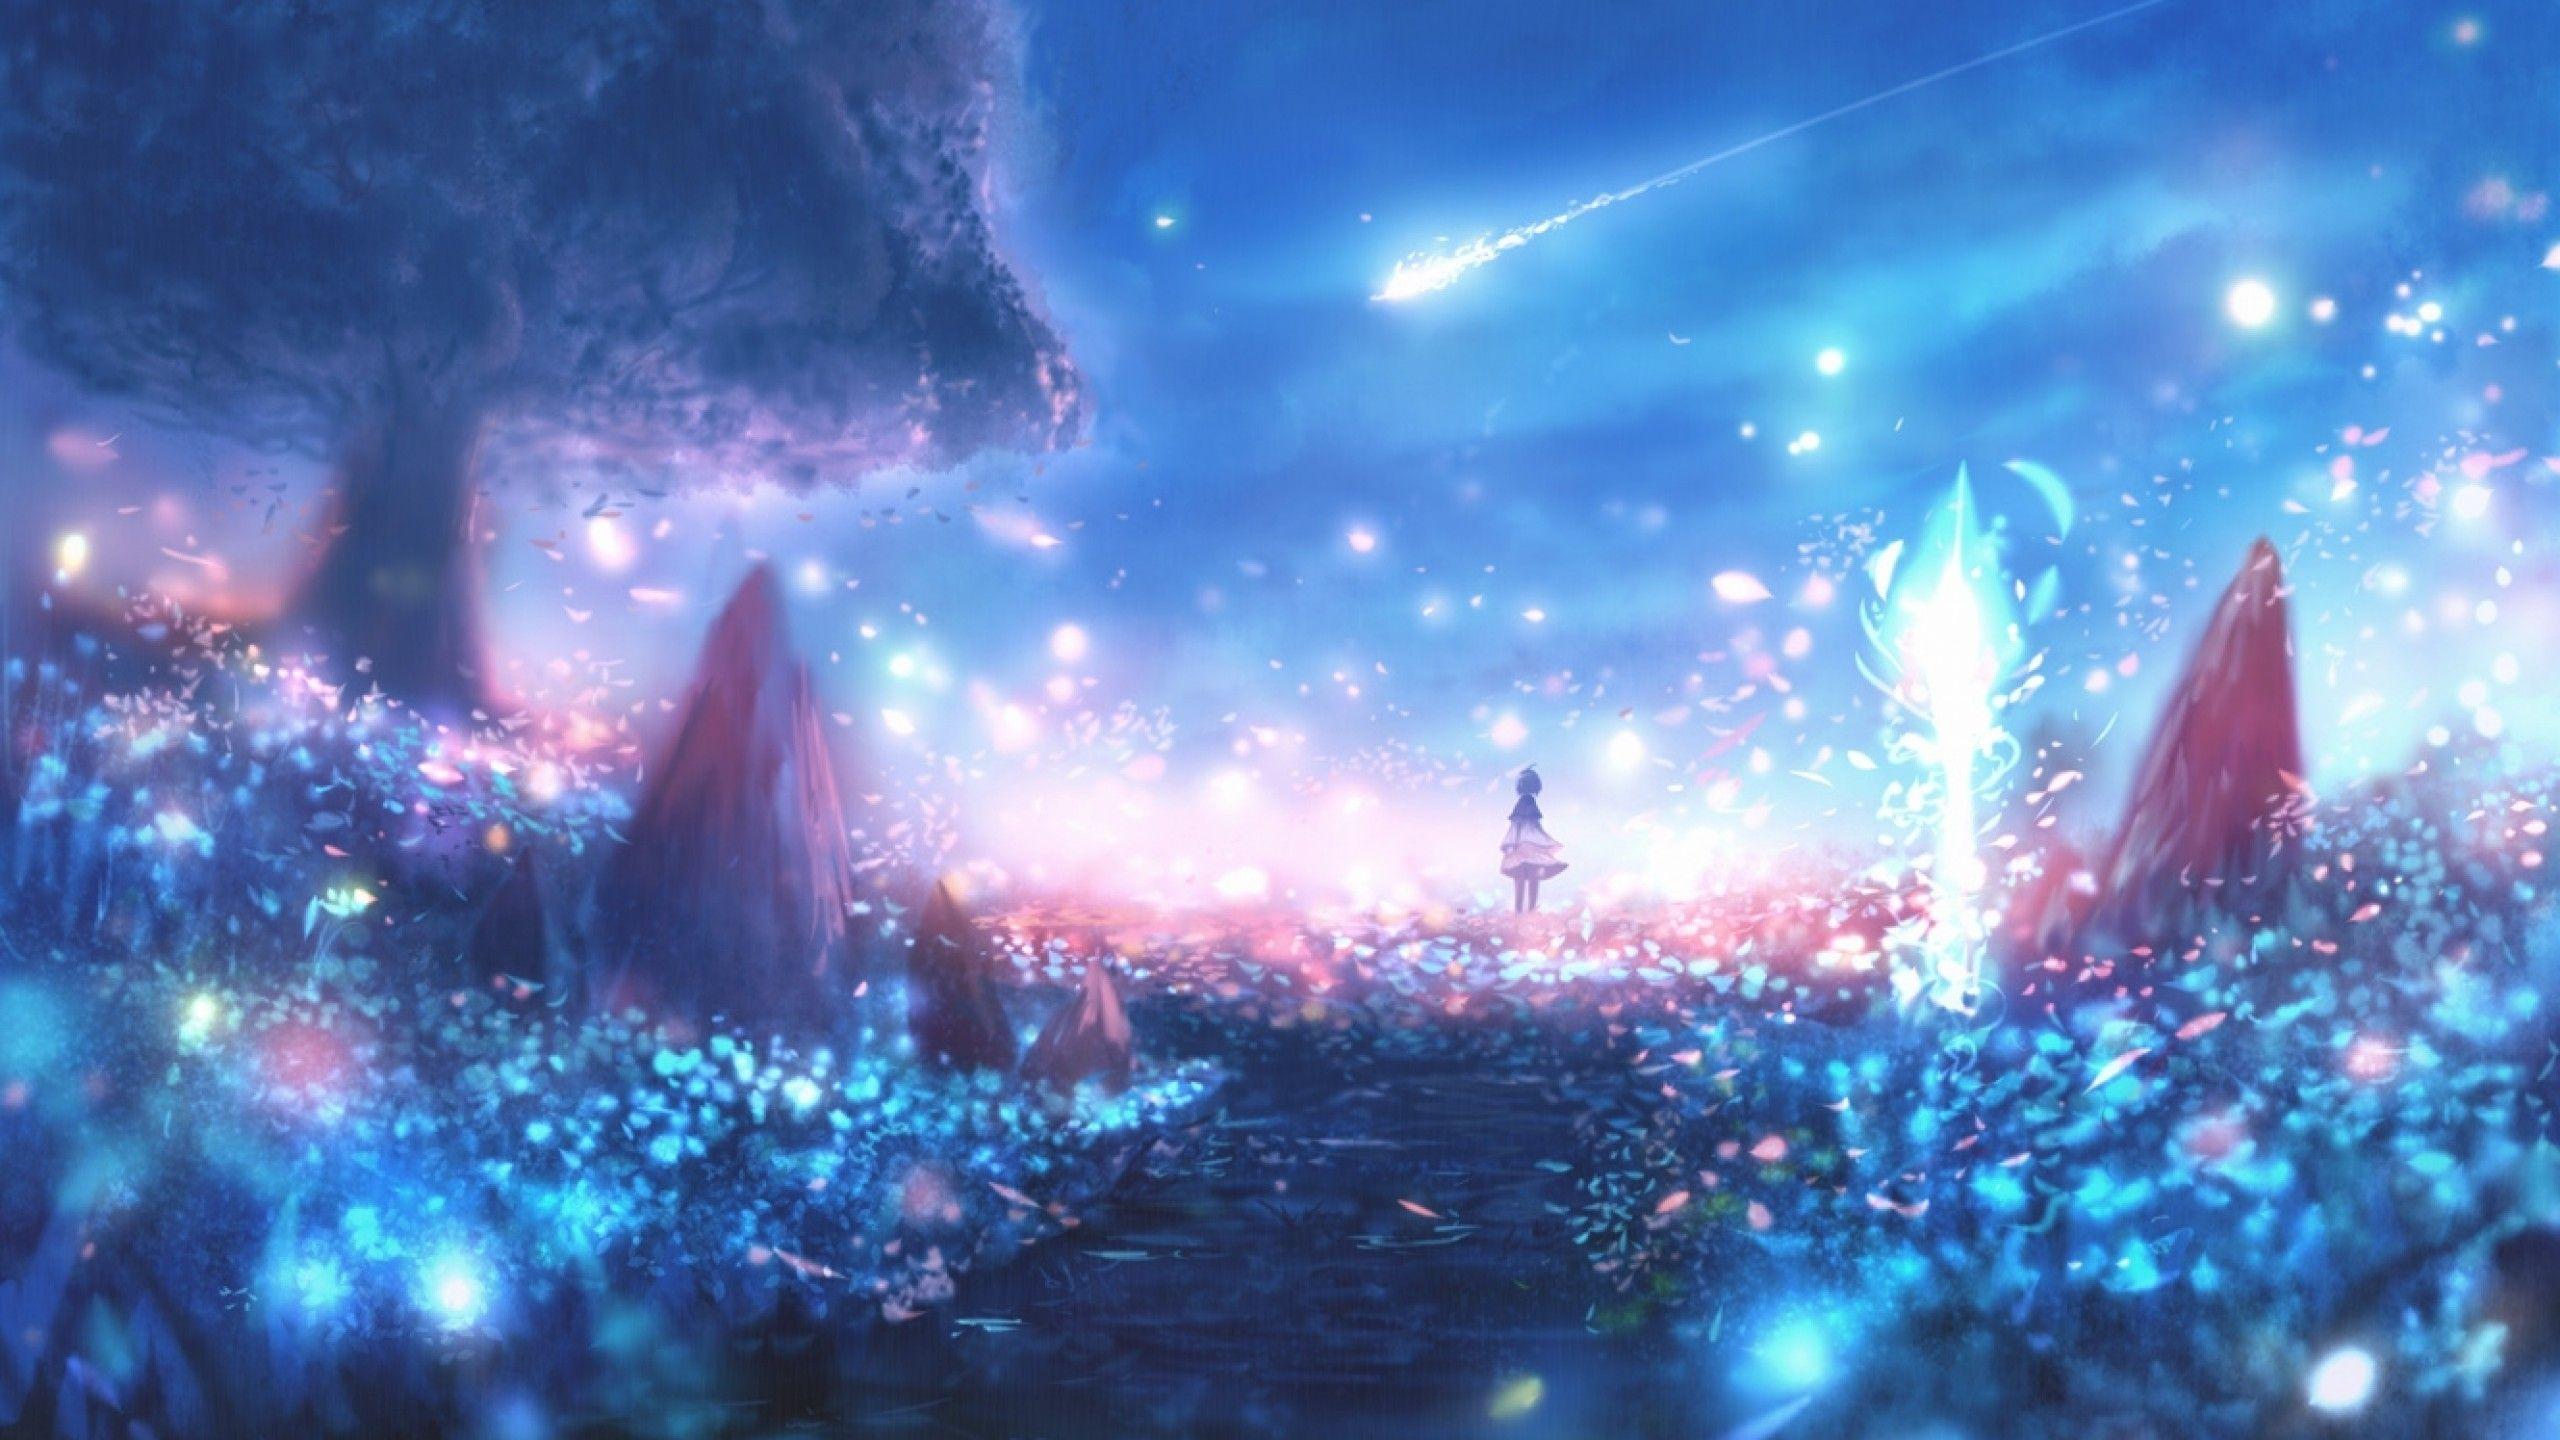 Wallpaper Anime 30 Anime Wallpapers Download At Wallpaperbro Beautiful Anime Background Night 2560x1440 Wallpaper Teahub Io